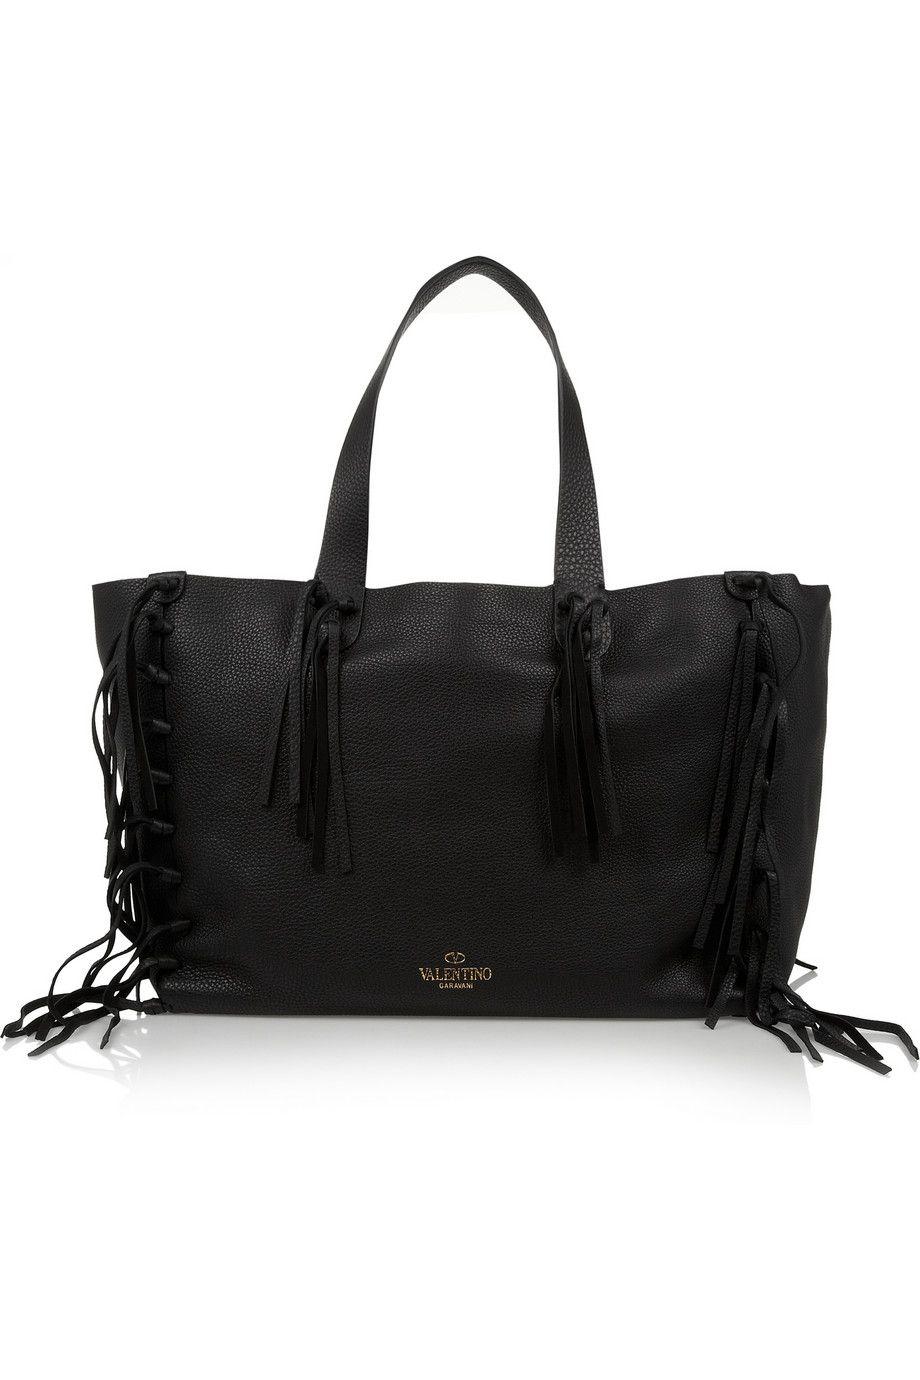 Valentino|C-Rockee tasseled leather tote|NET-A-PORTER.COM